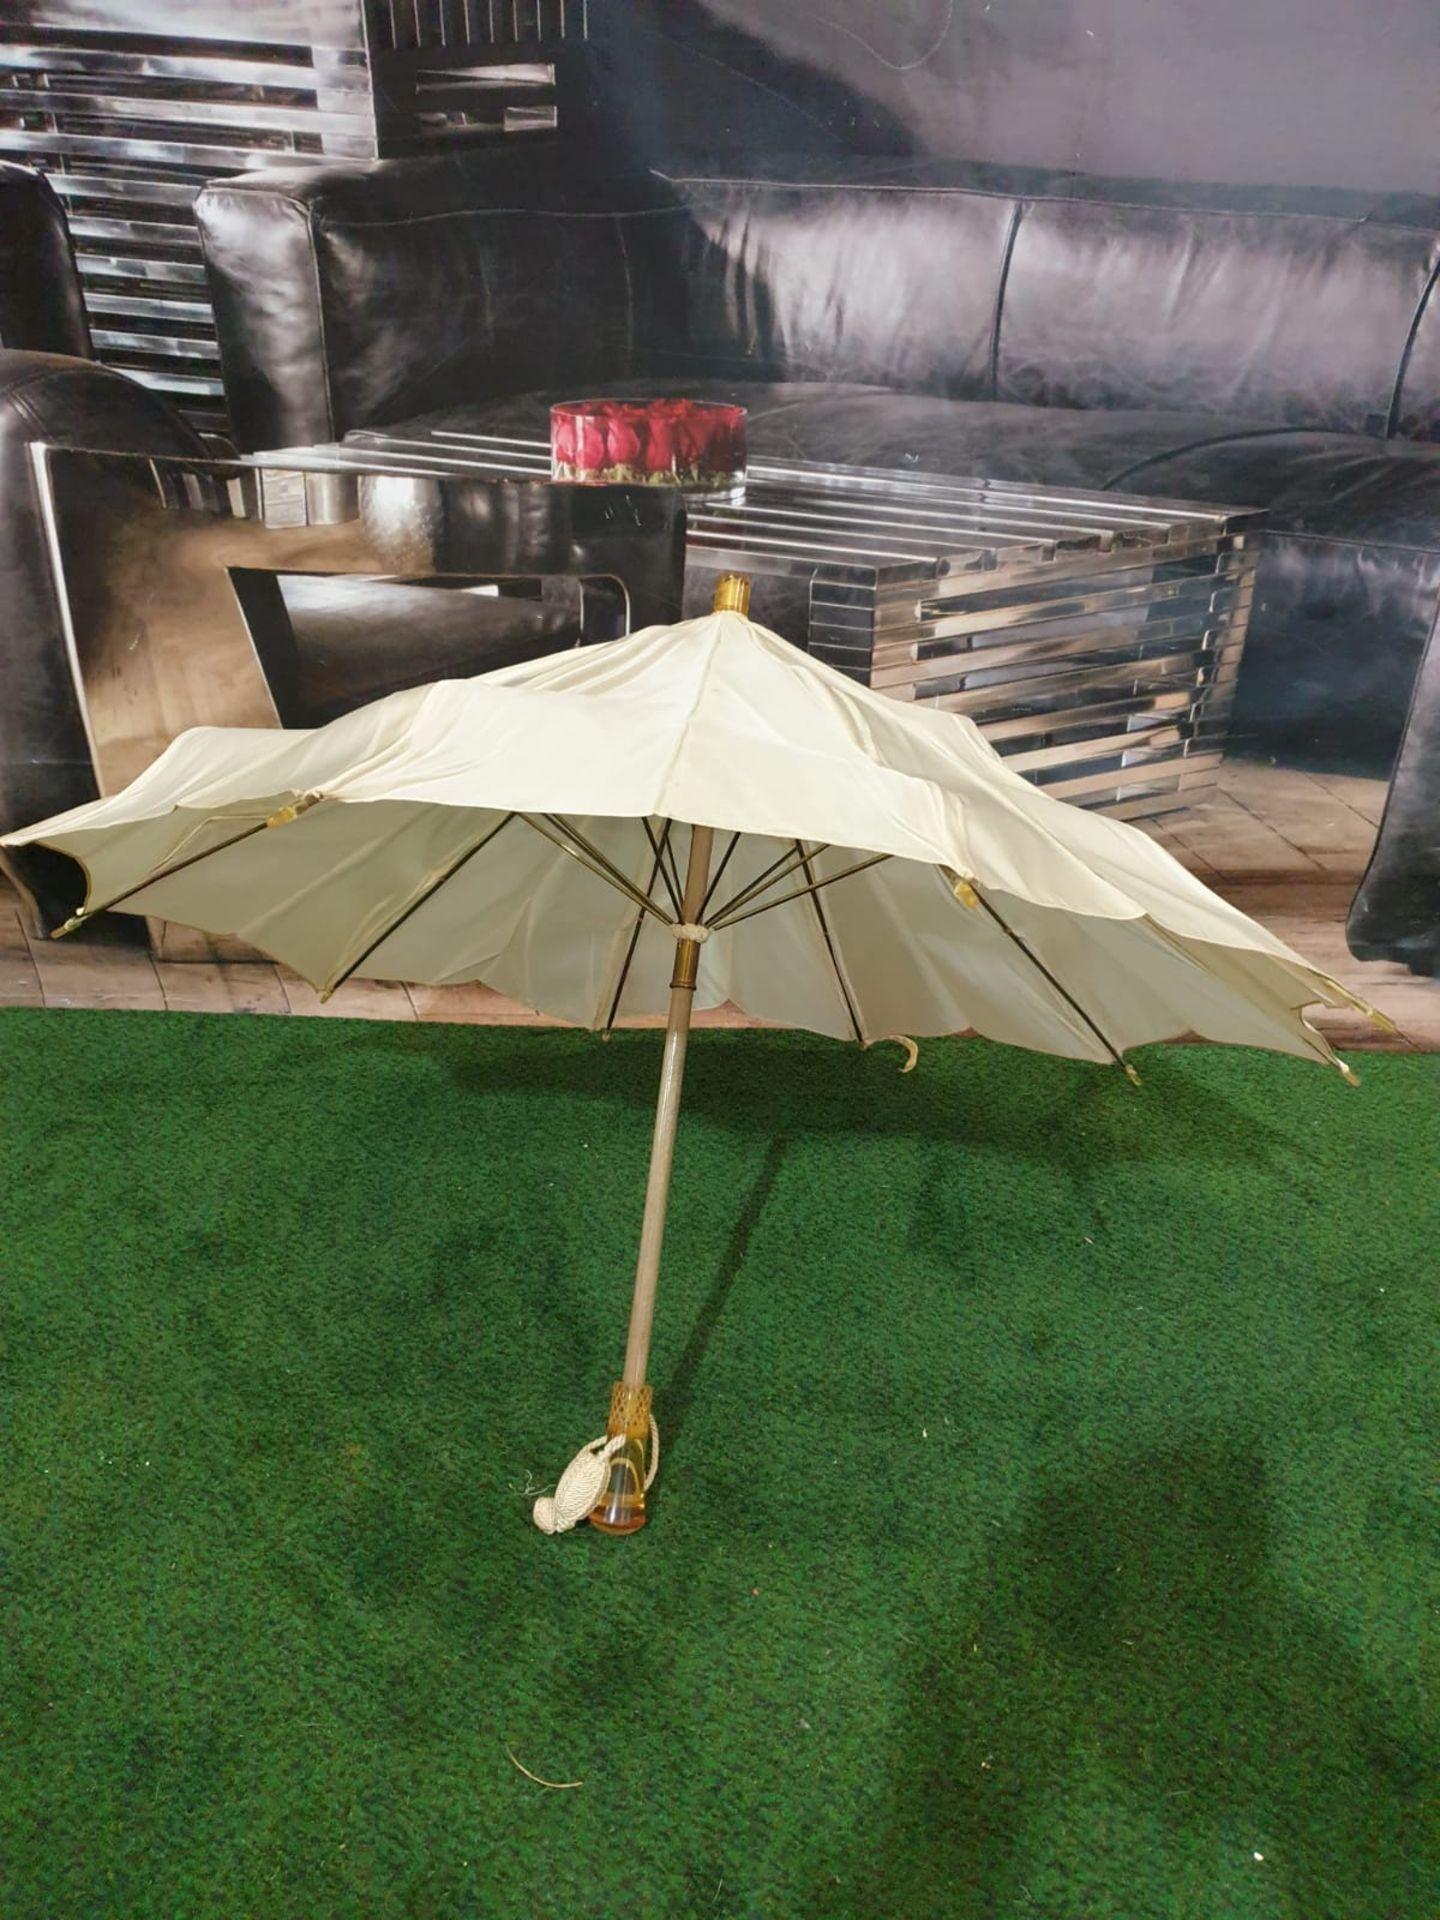 Ladies parasol Cream silk-like material - Yellow handle. Needs T.L.C. - Image 2 of 4